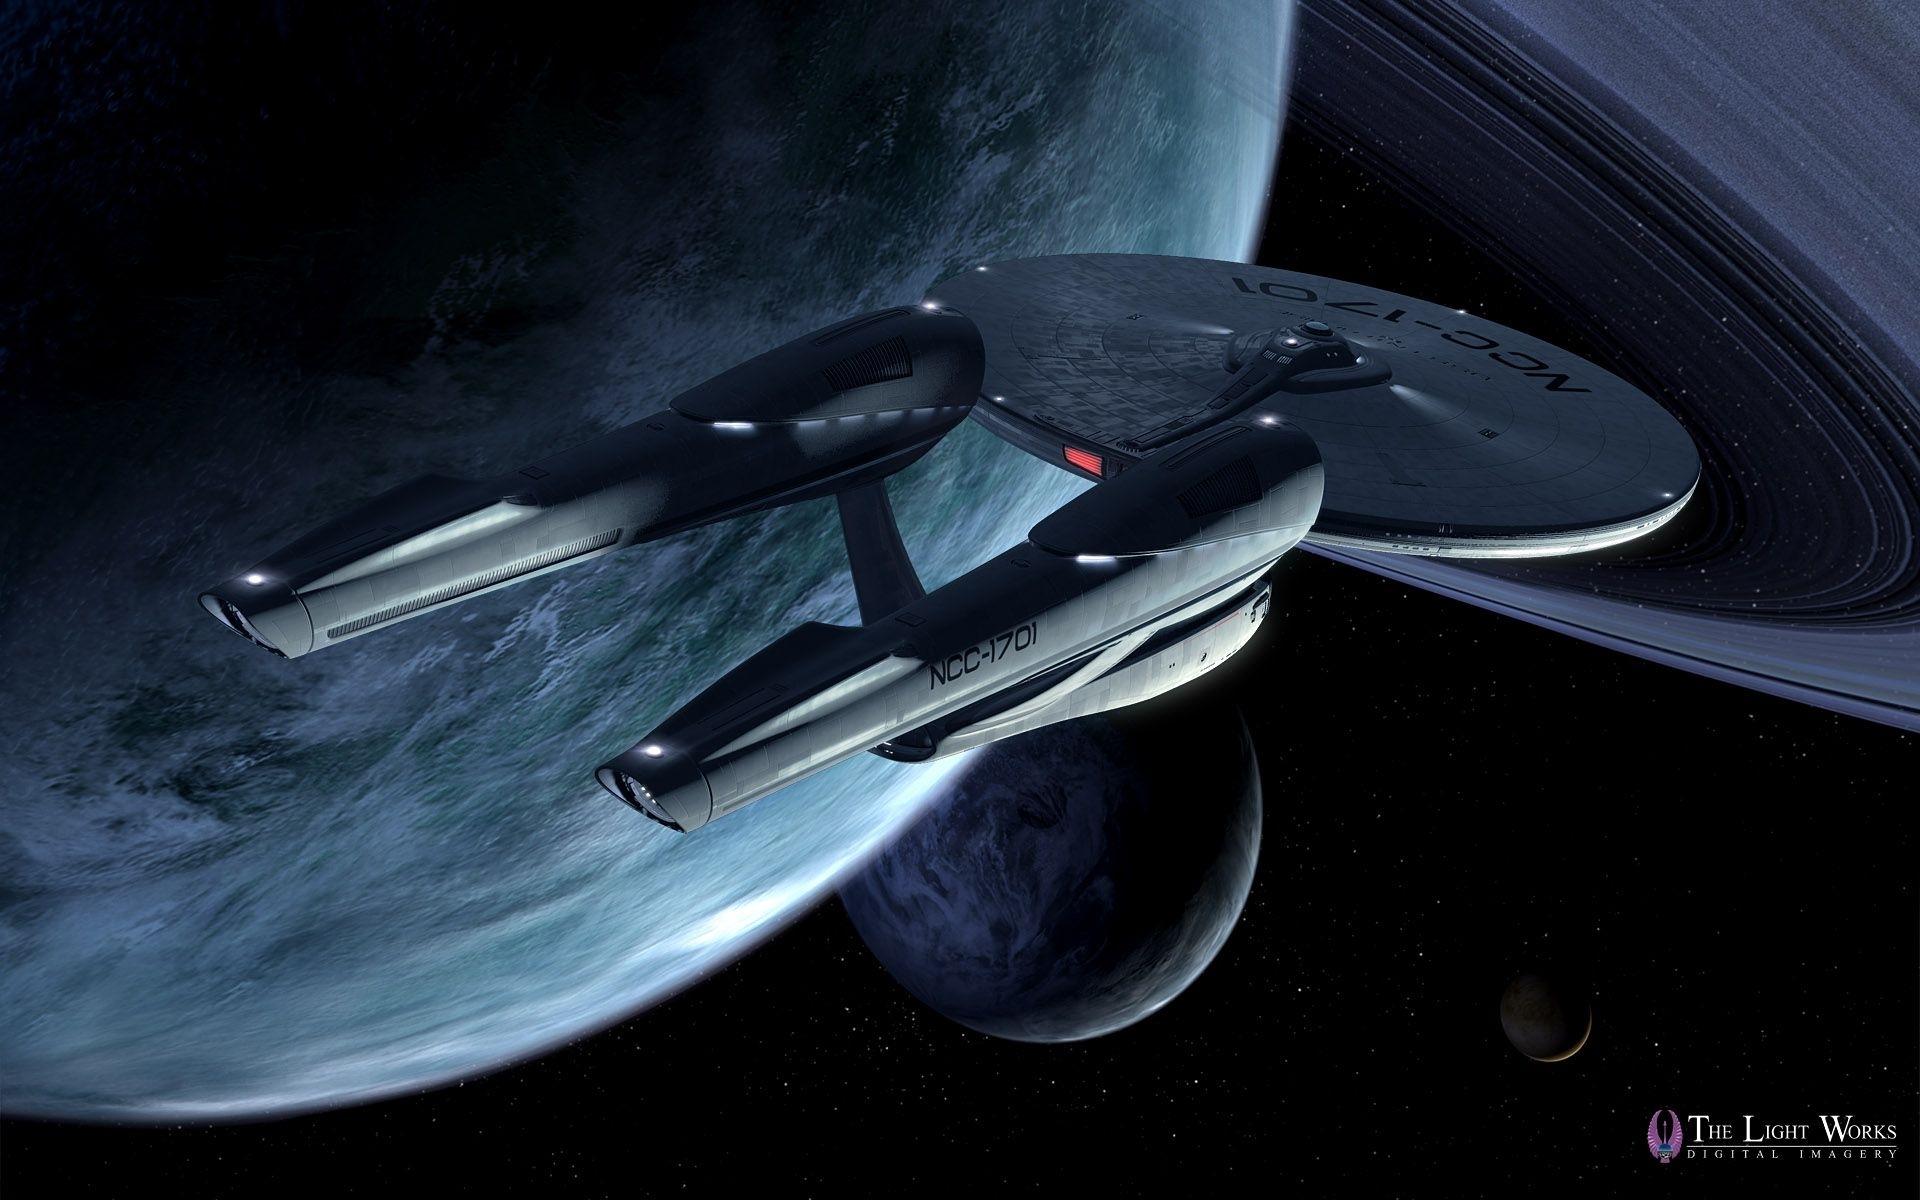 star trek 2009 ships | first look at tobias richter's star trek